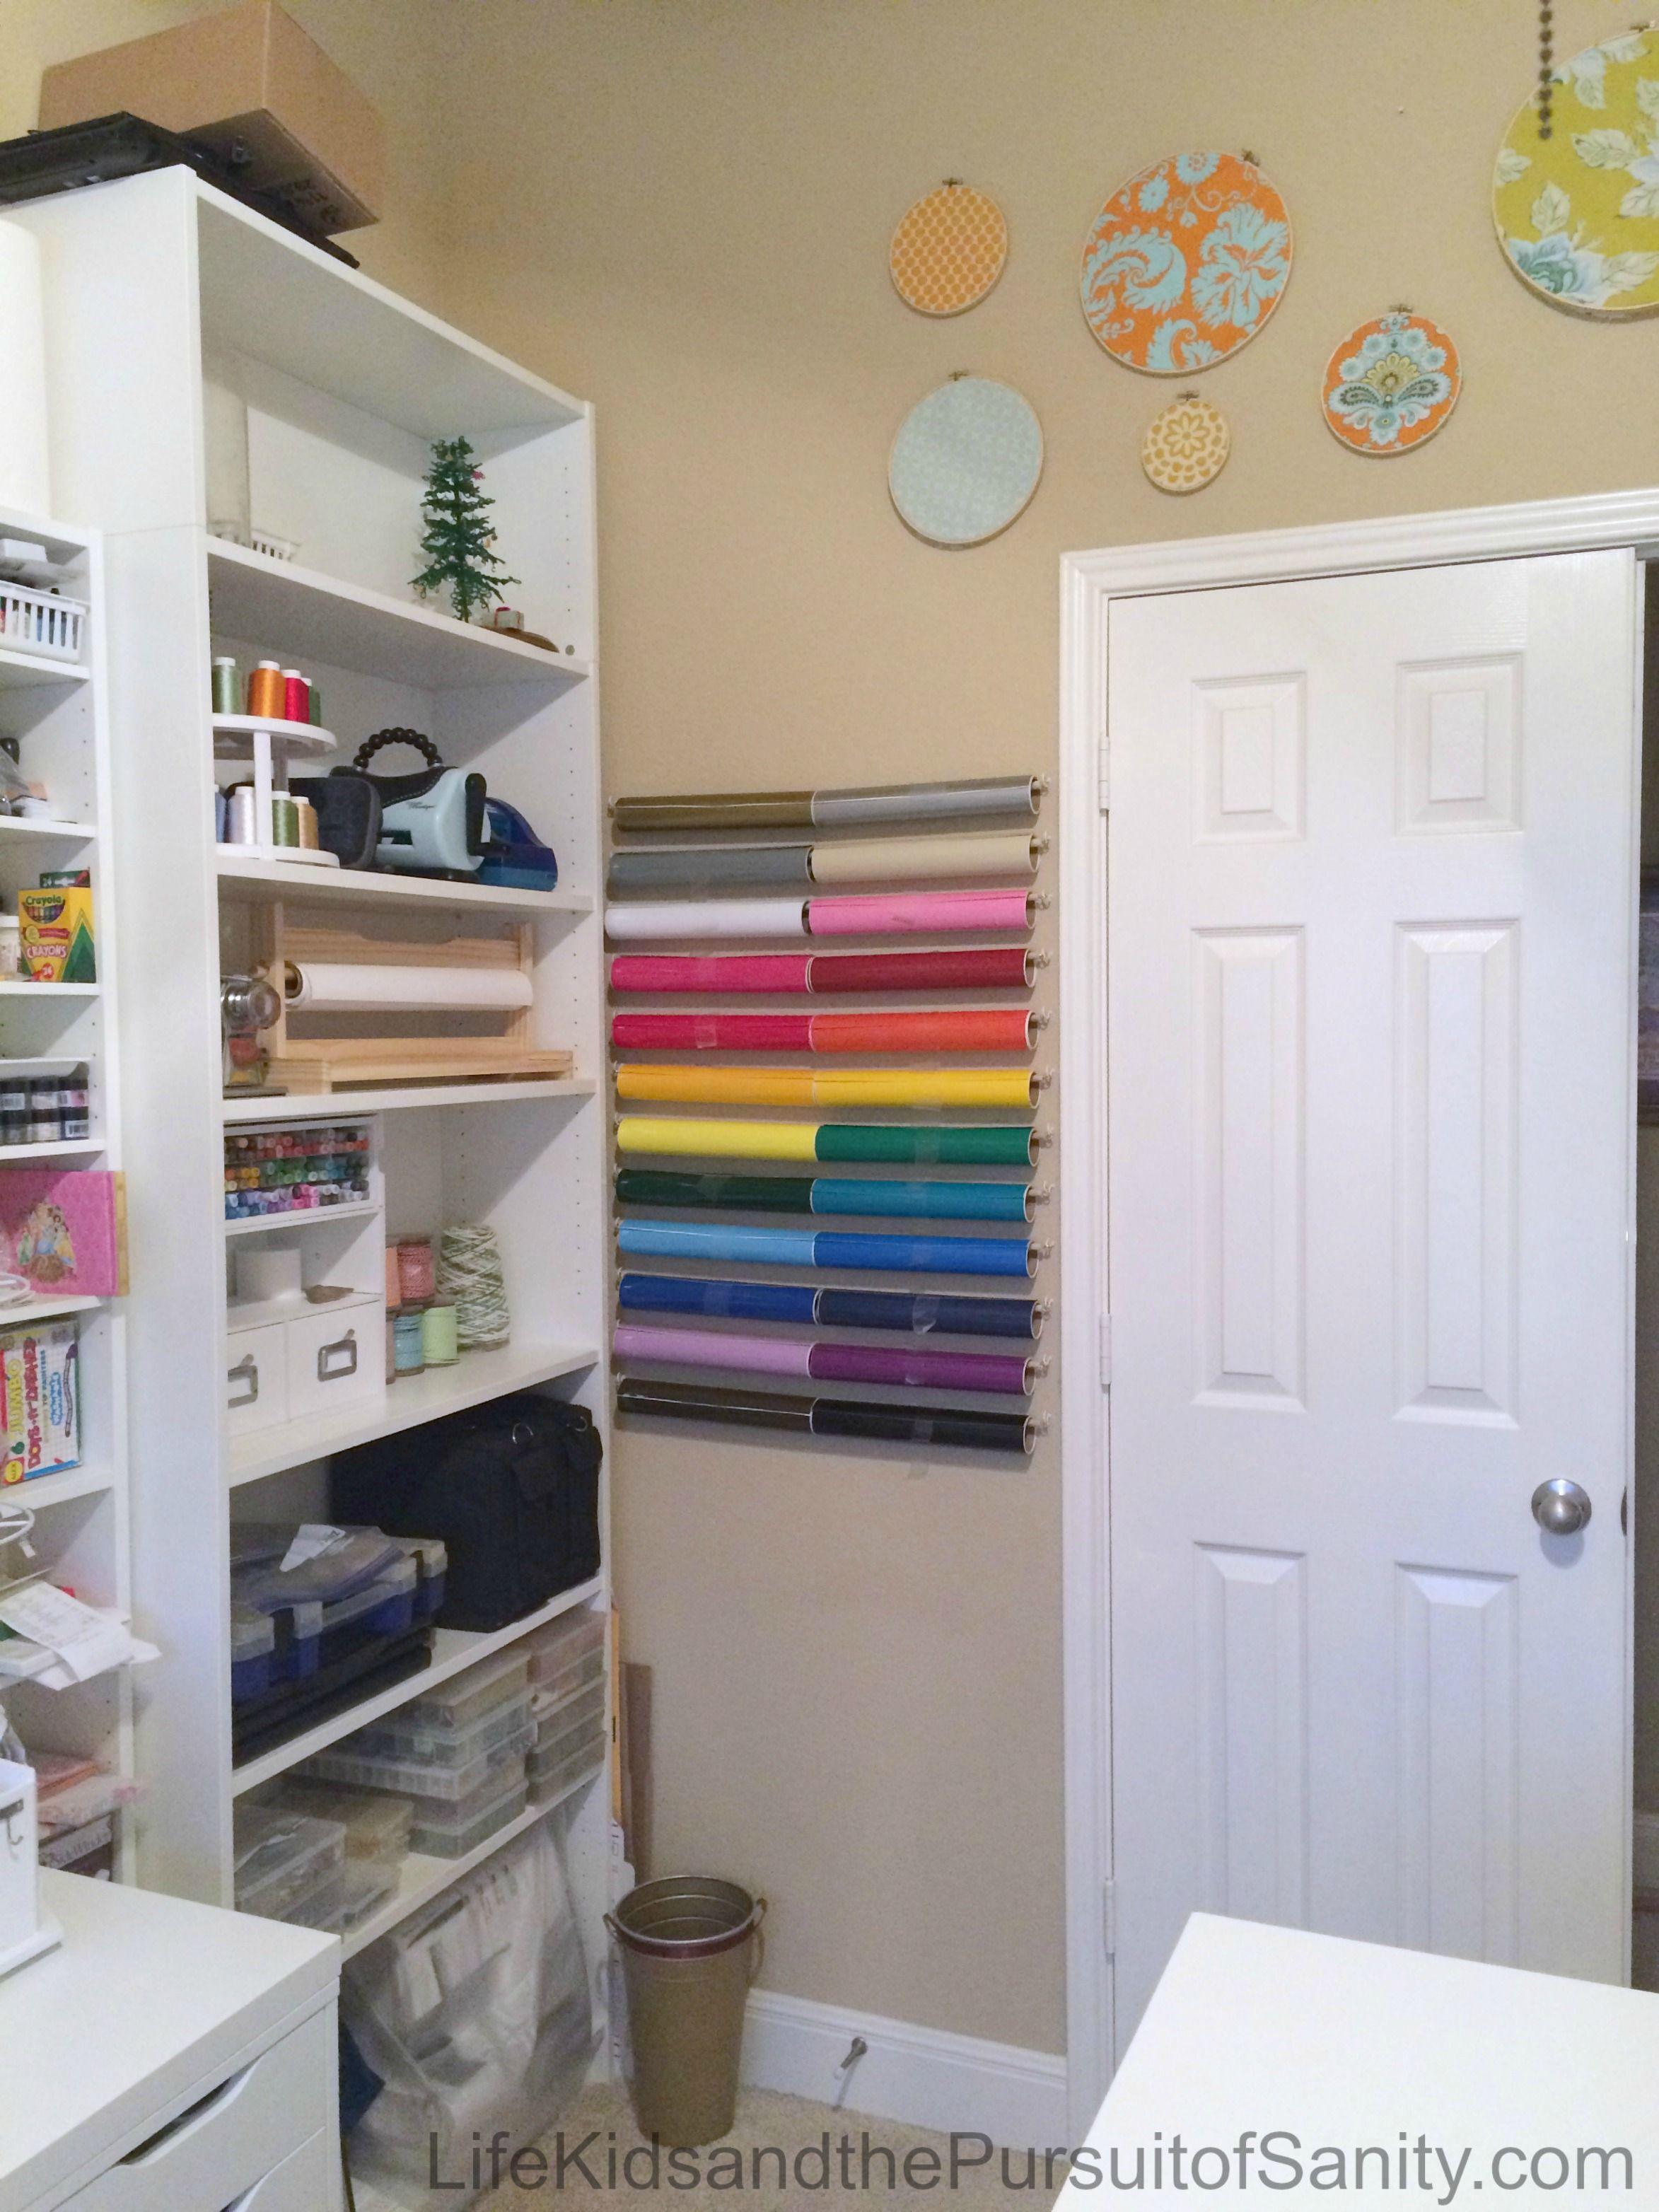 Cool Hanging Bunk Beds Storage Specialty Contractors Sprinklers Bath